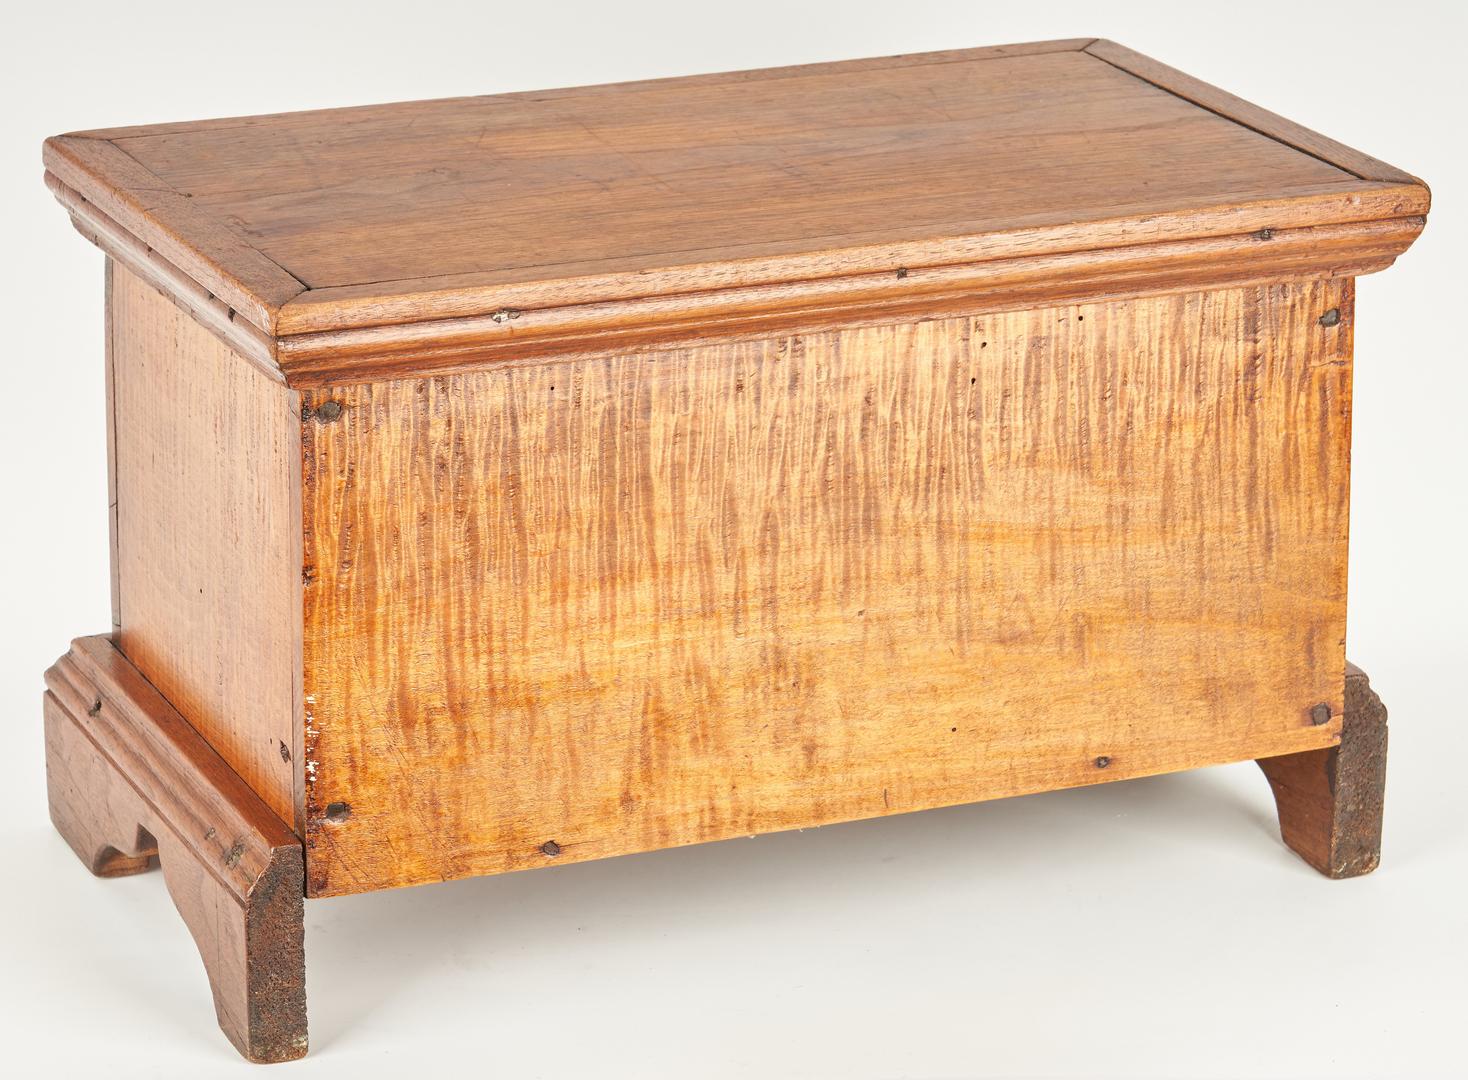 Lot 348: Miniature American Blanket Chest Box & Document Box